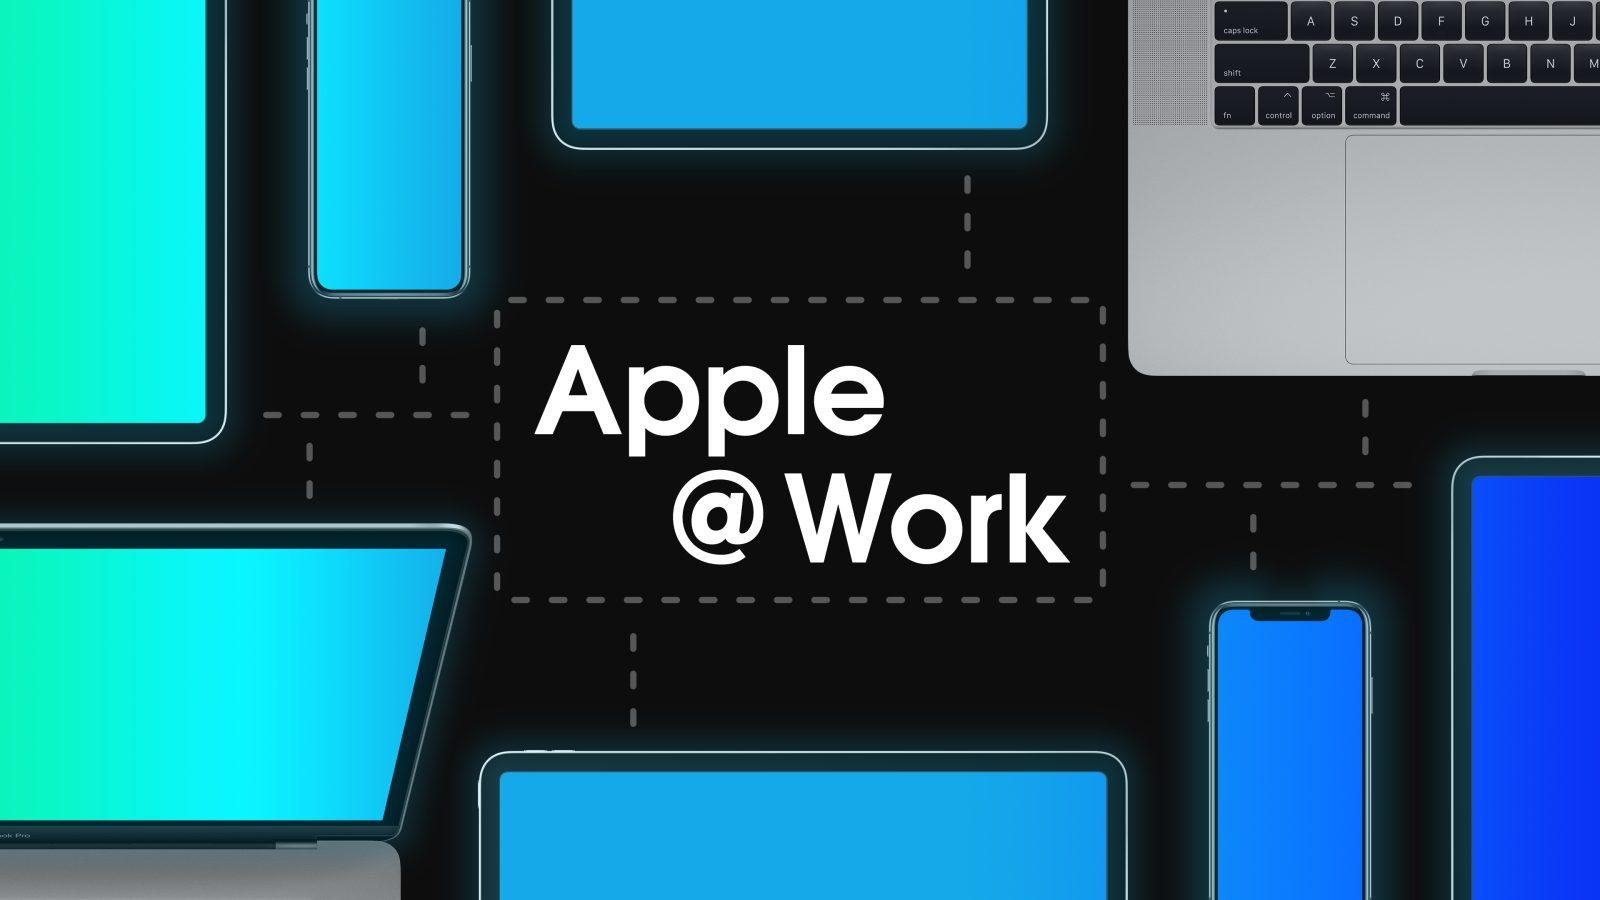 Apple @ Work: How Mac and iOS work in the enterprise - 9to5Mac